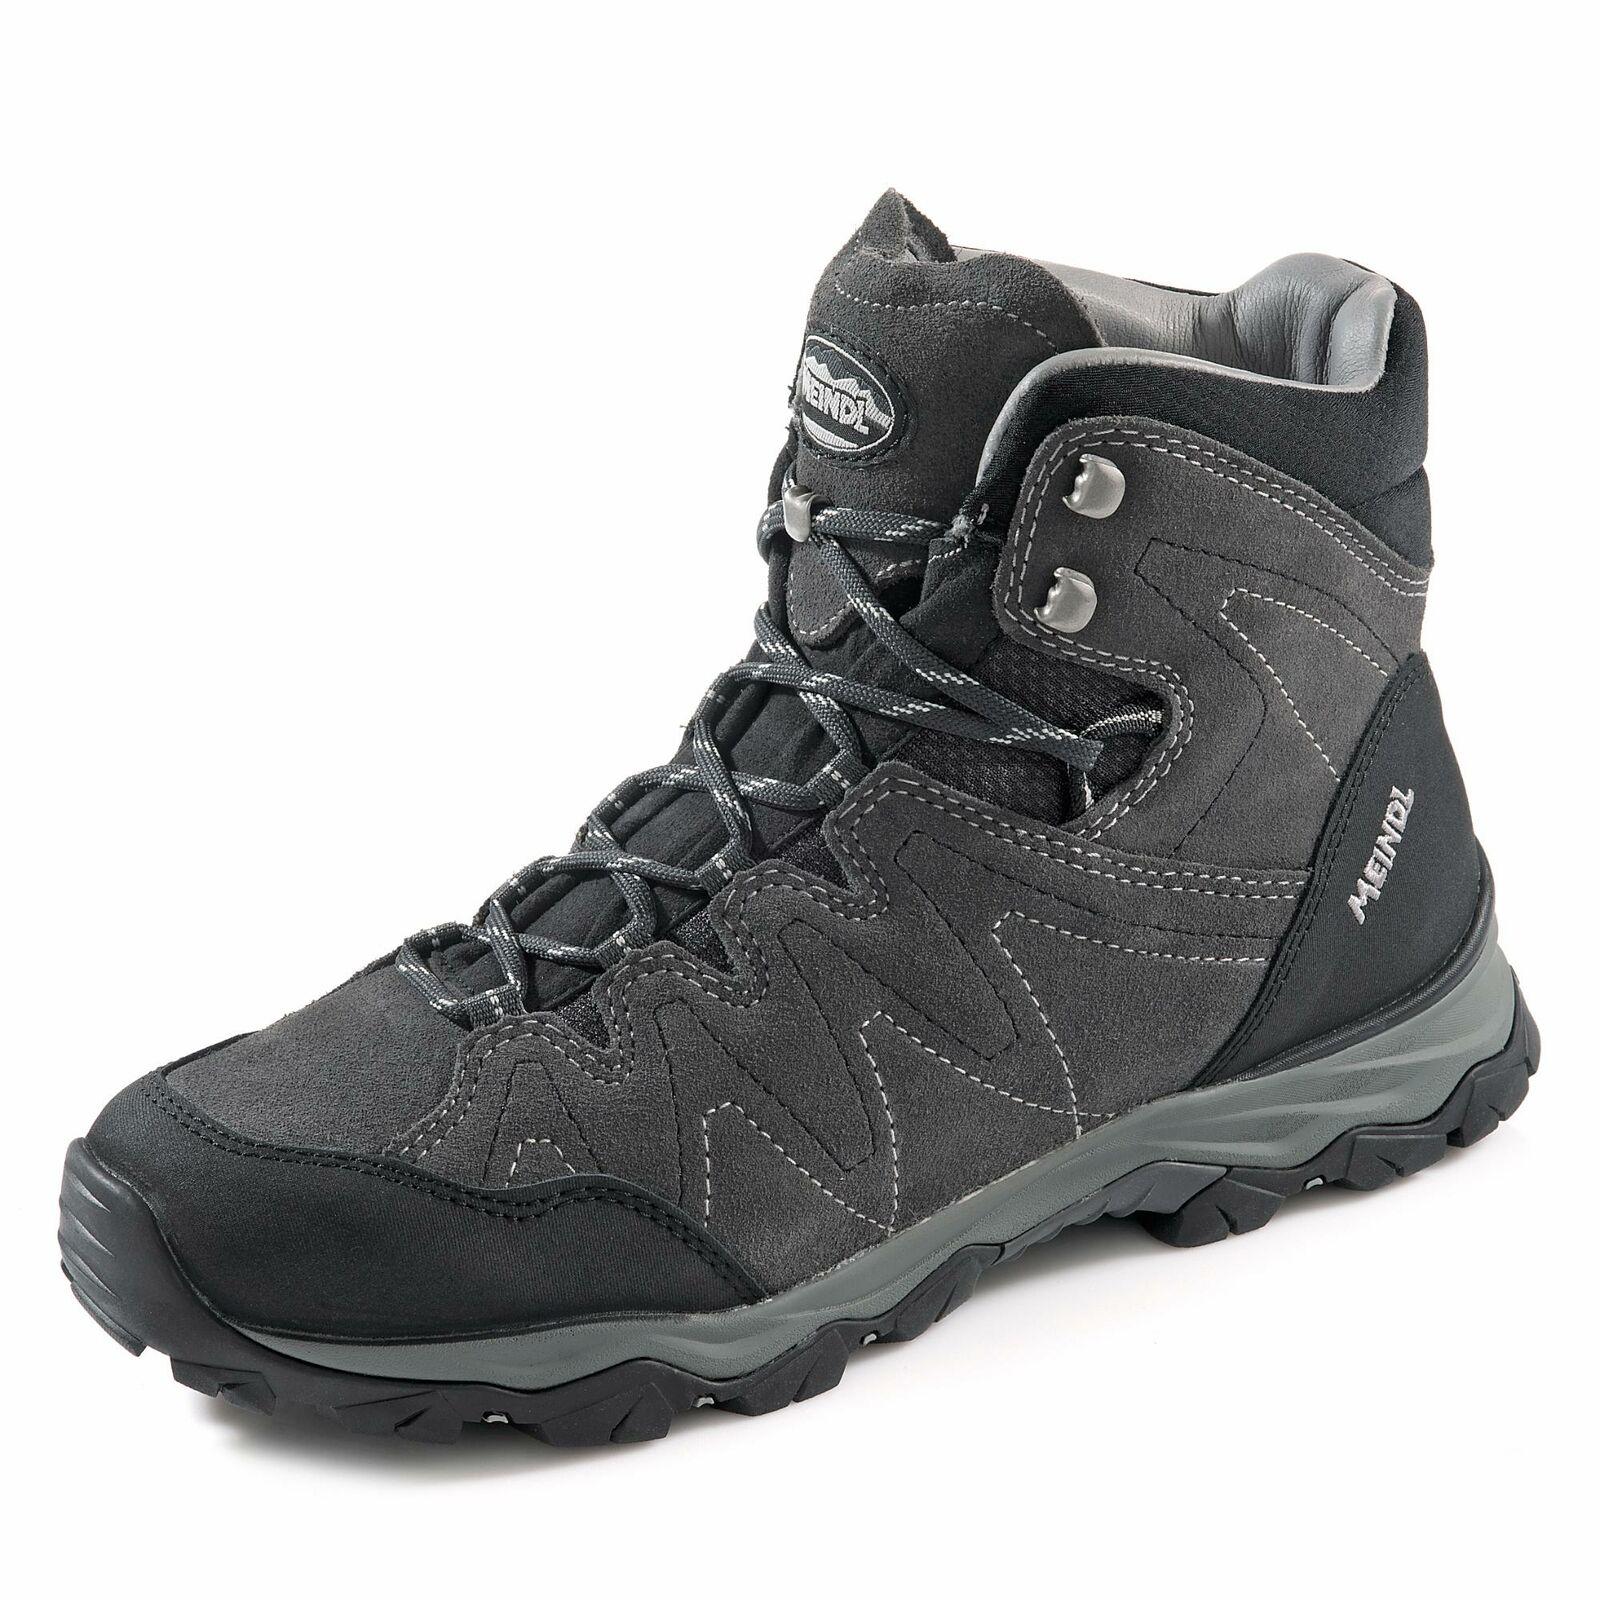 Meindl Elba Elba Elba Herren Wanderstiefel Outdoorschuhe Trekkingschuhe Schuhe anthrazit 41149a